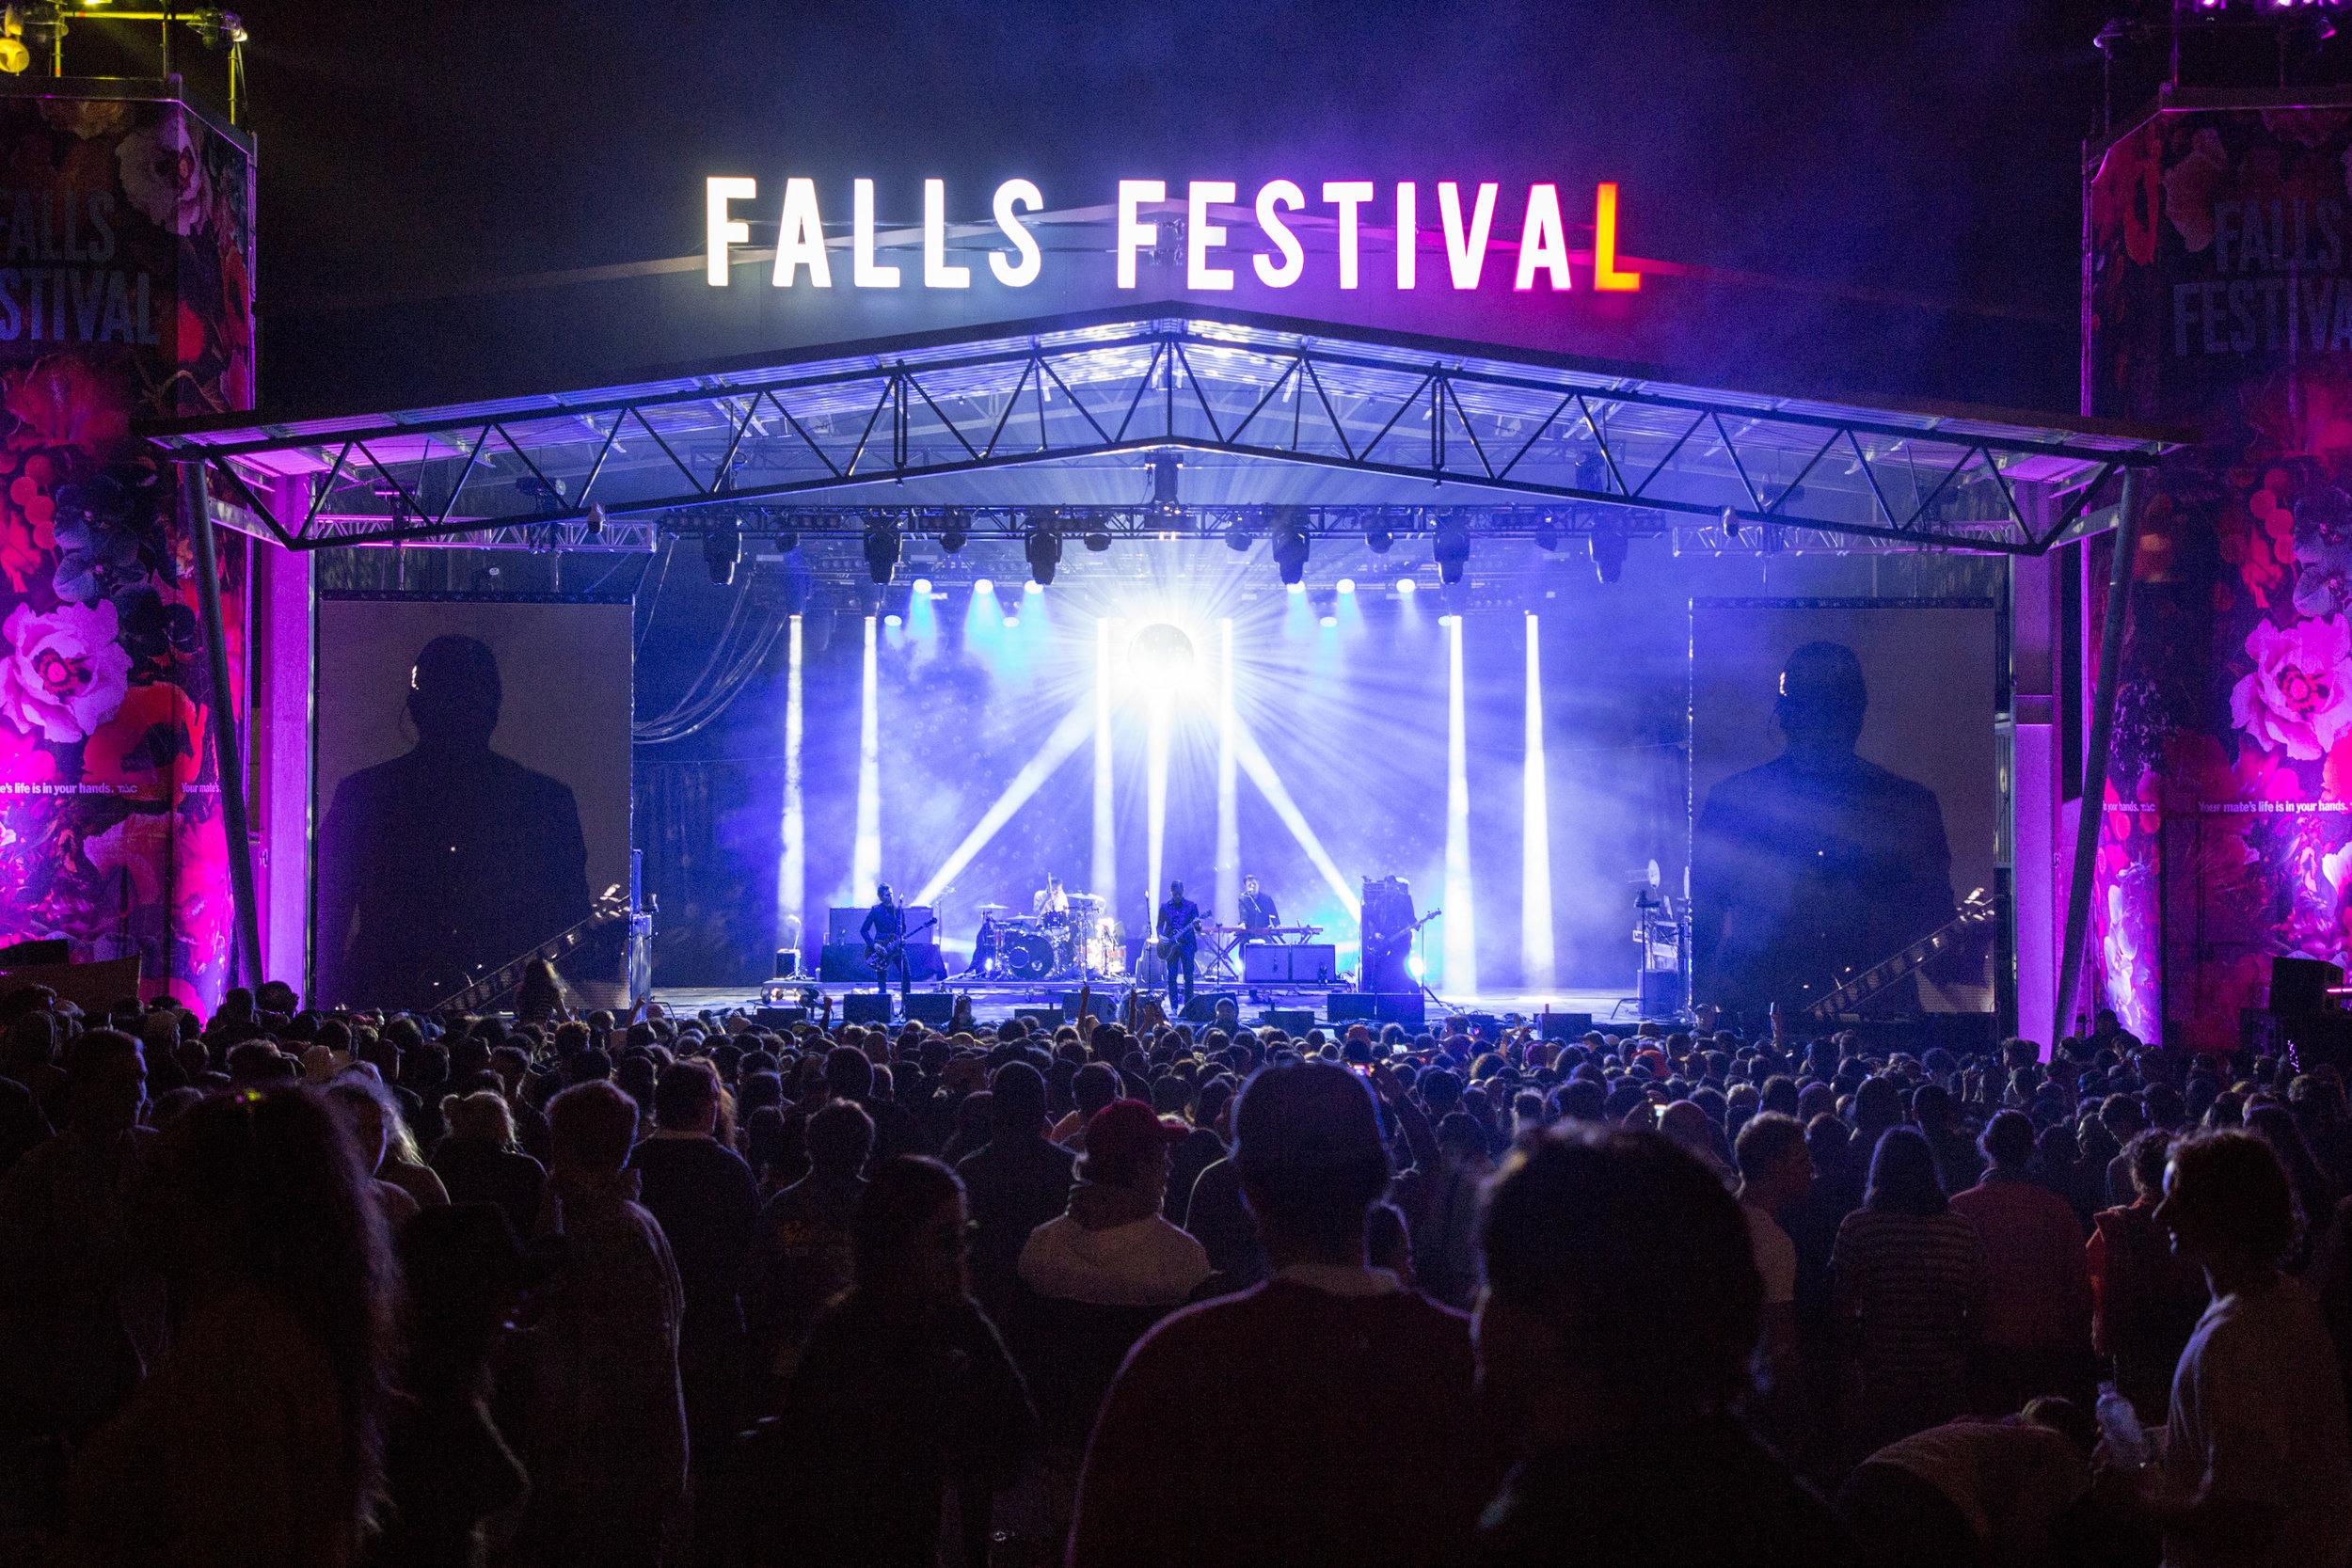 20_interpol_fallsfestival_18-19-5.jpg